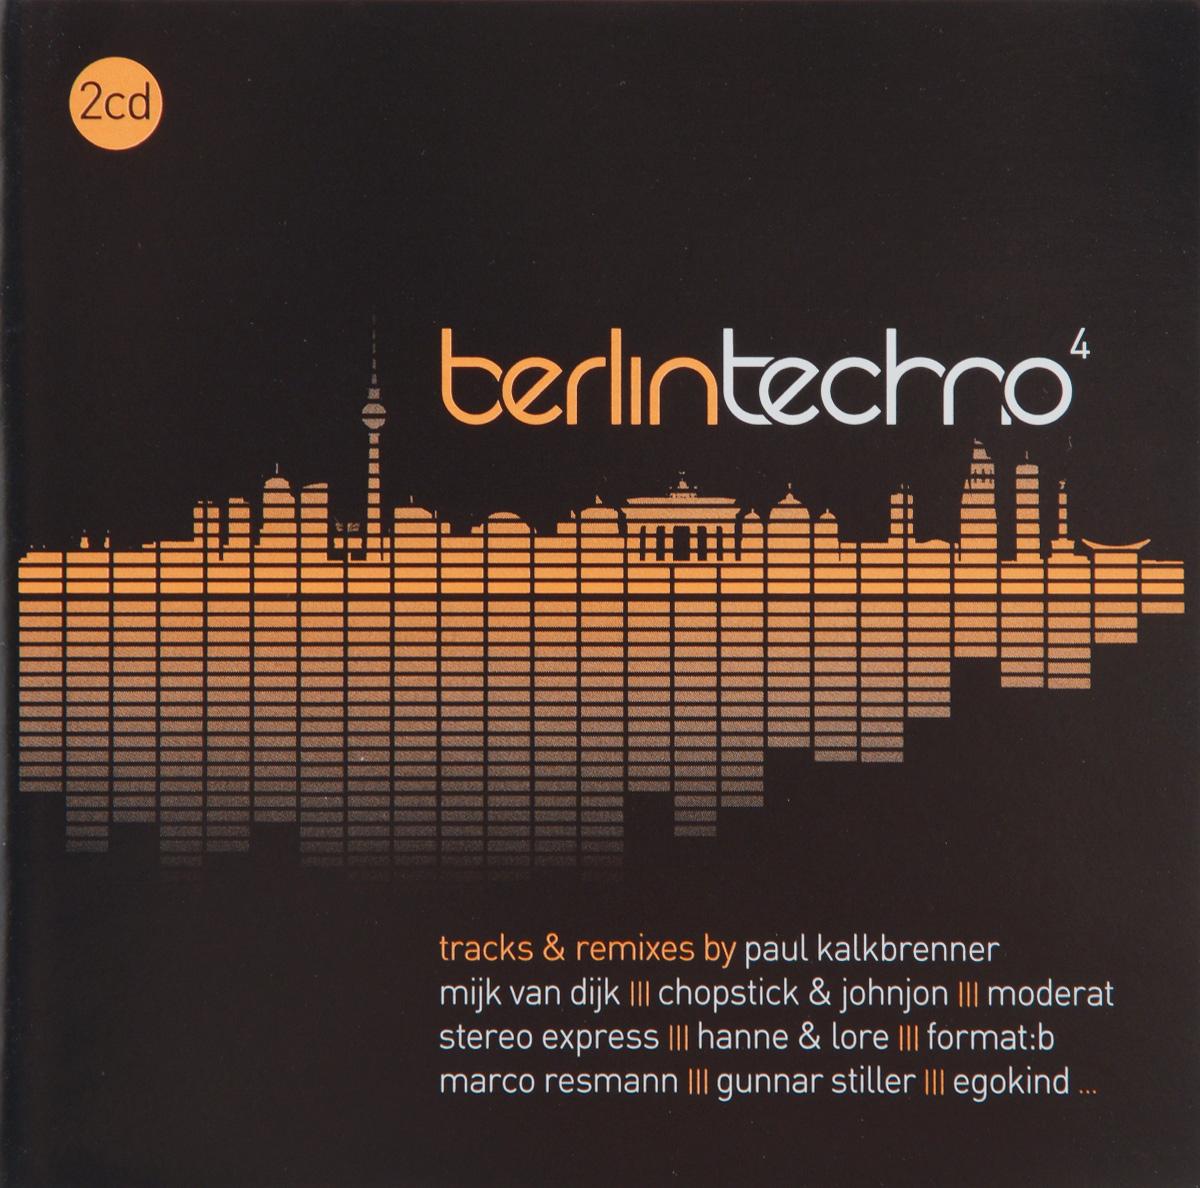 Berlin Techno 4 (2 CD) thalstroem мишель клейс toto la momposina sierra sam моника крузе telefon tel aviv makit namito berlin techno